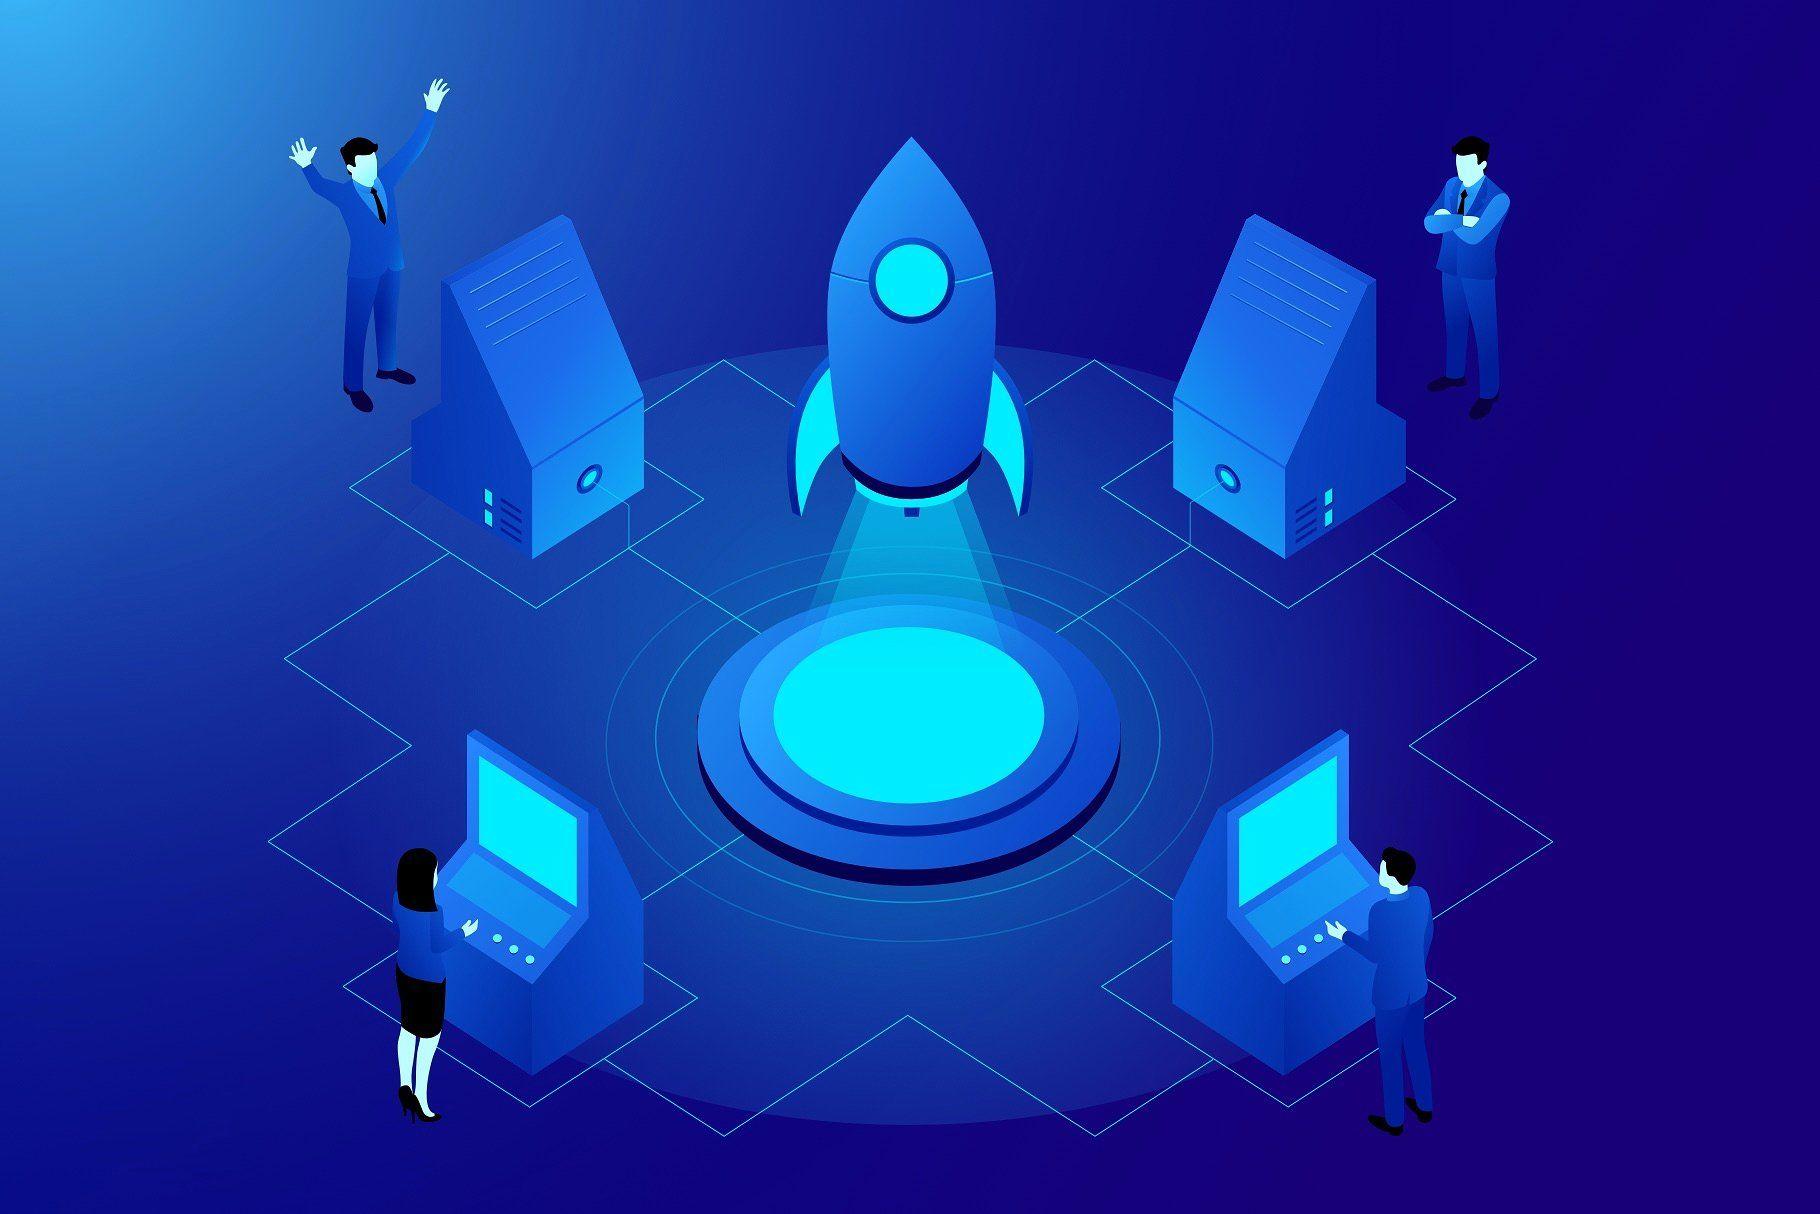 Crypto & Tech Isometric website templates, website design